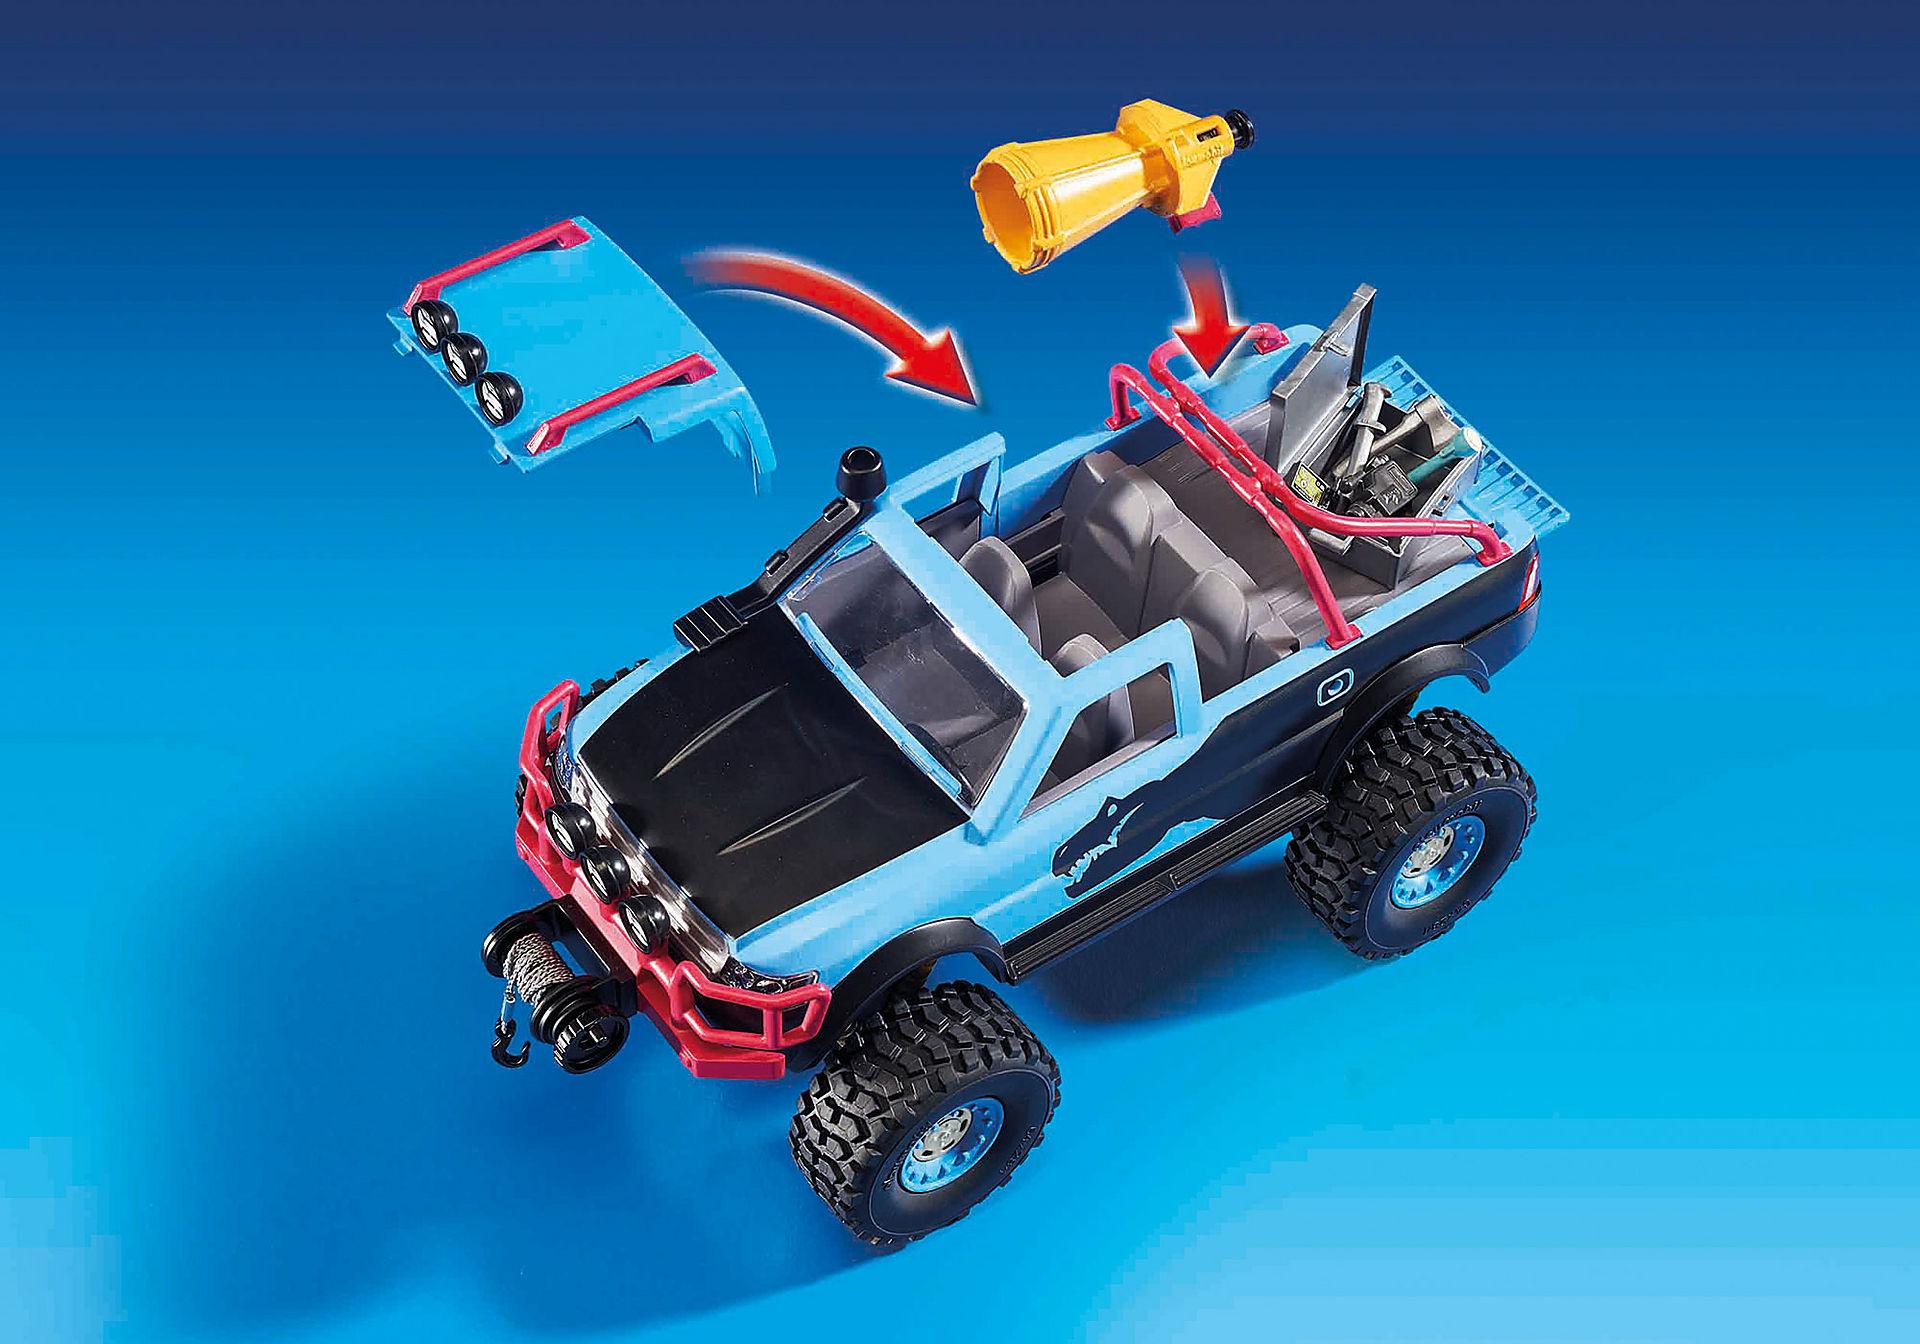 http://media.playmobil.com/i/playmobil/9407_product_extra3/Monster Truck mit Alex und Rock Brock